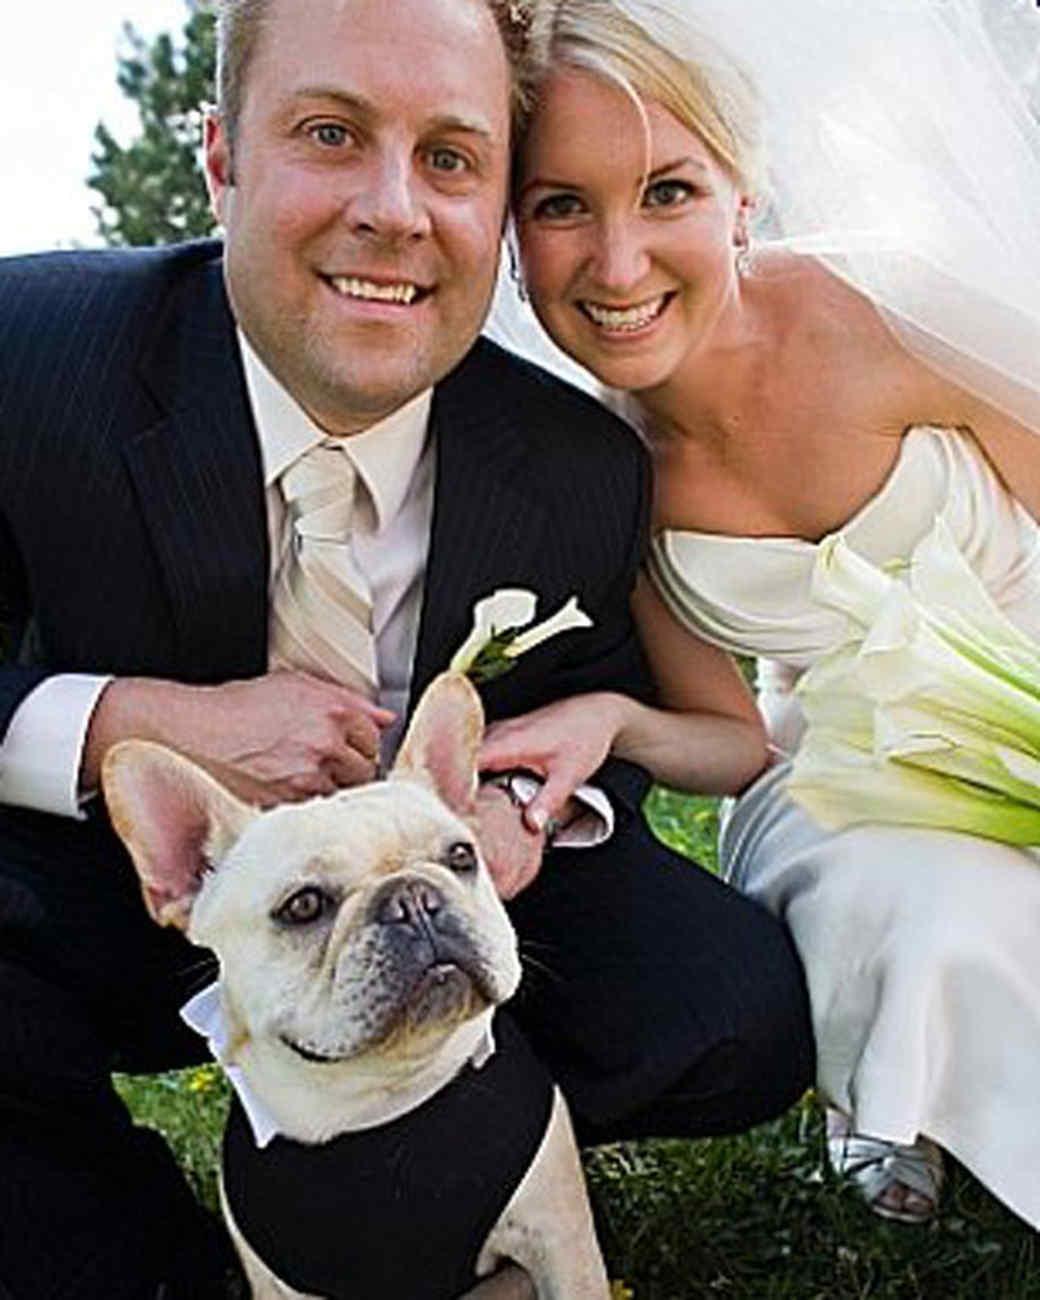 pets_wedding_89712.jpg